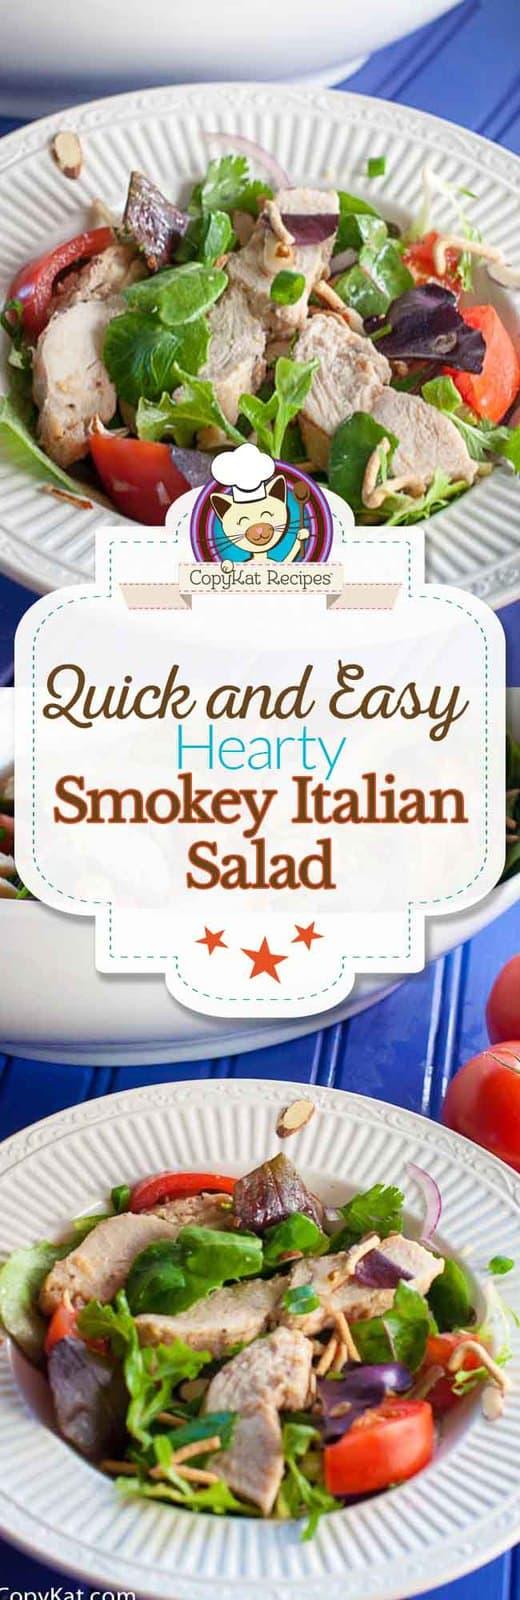 Enjoy this Smokey Italian Salad Dressing made with Wish-Bone® Italian Dressing and Tyson® Grilled & Ready® Chicken #TBD.